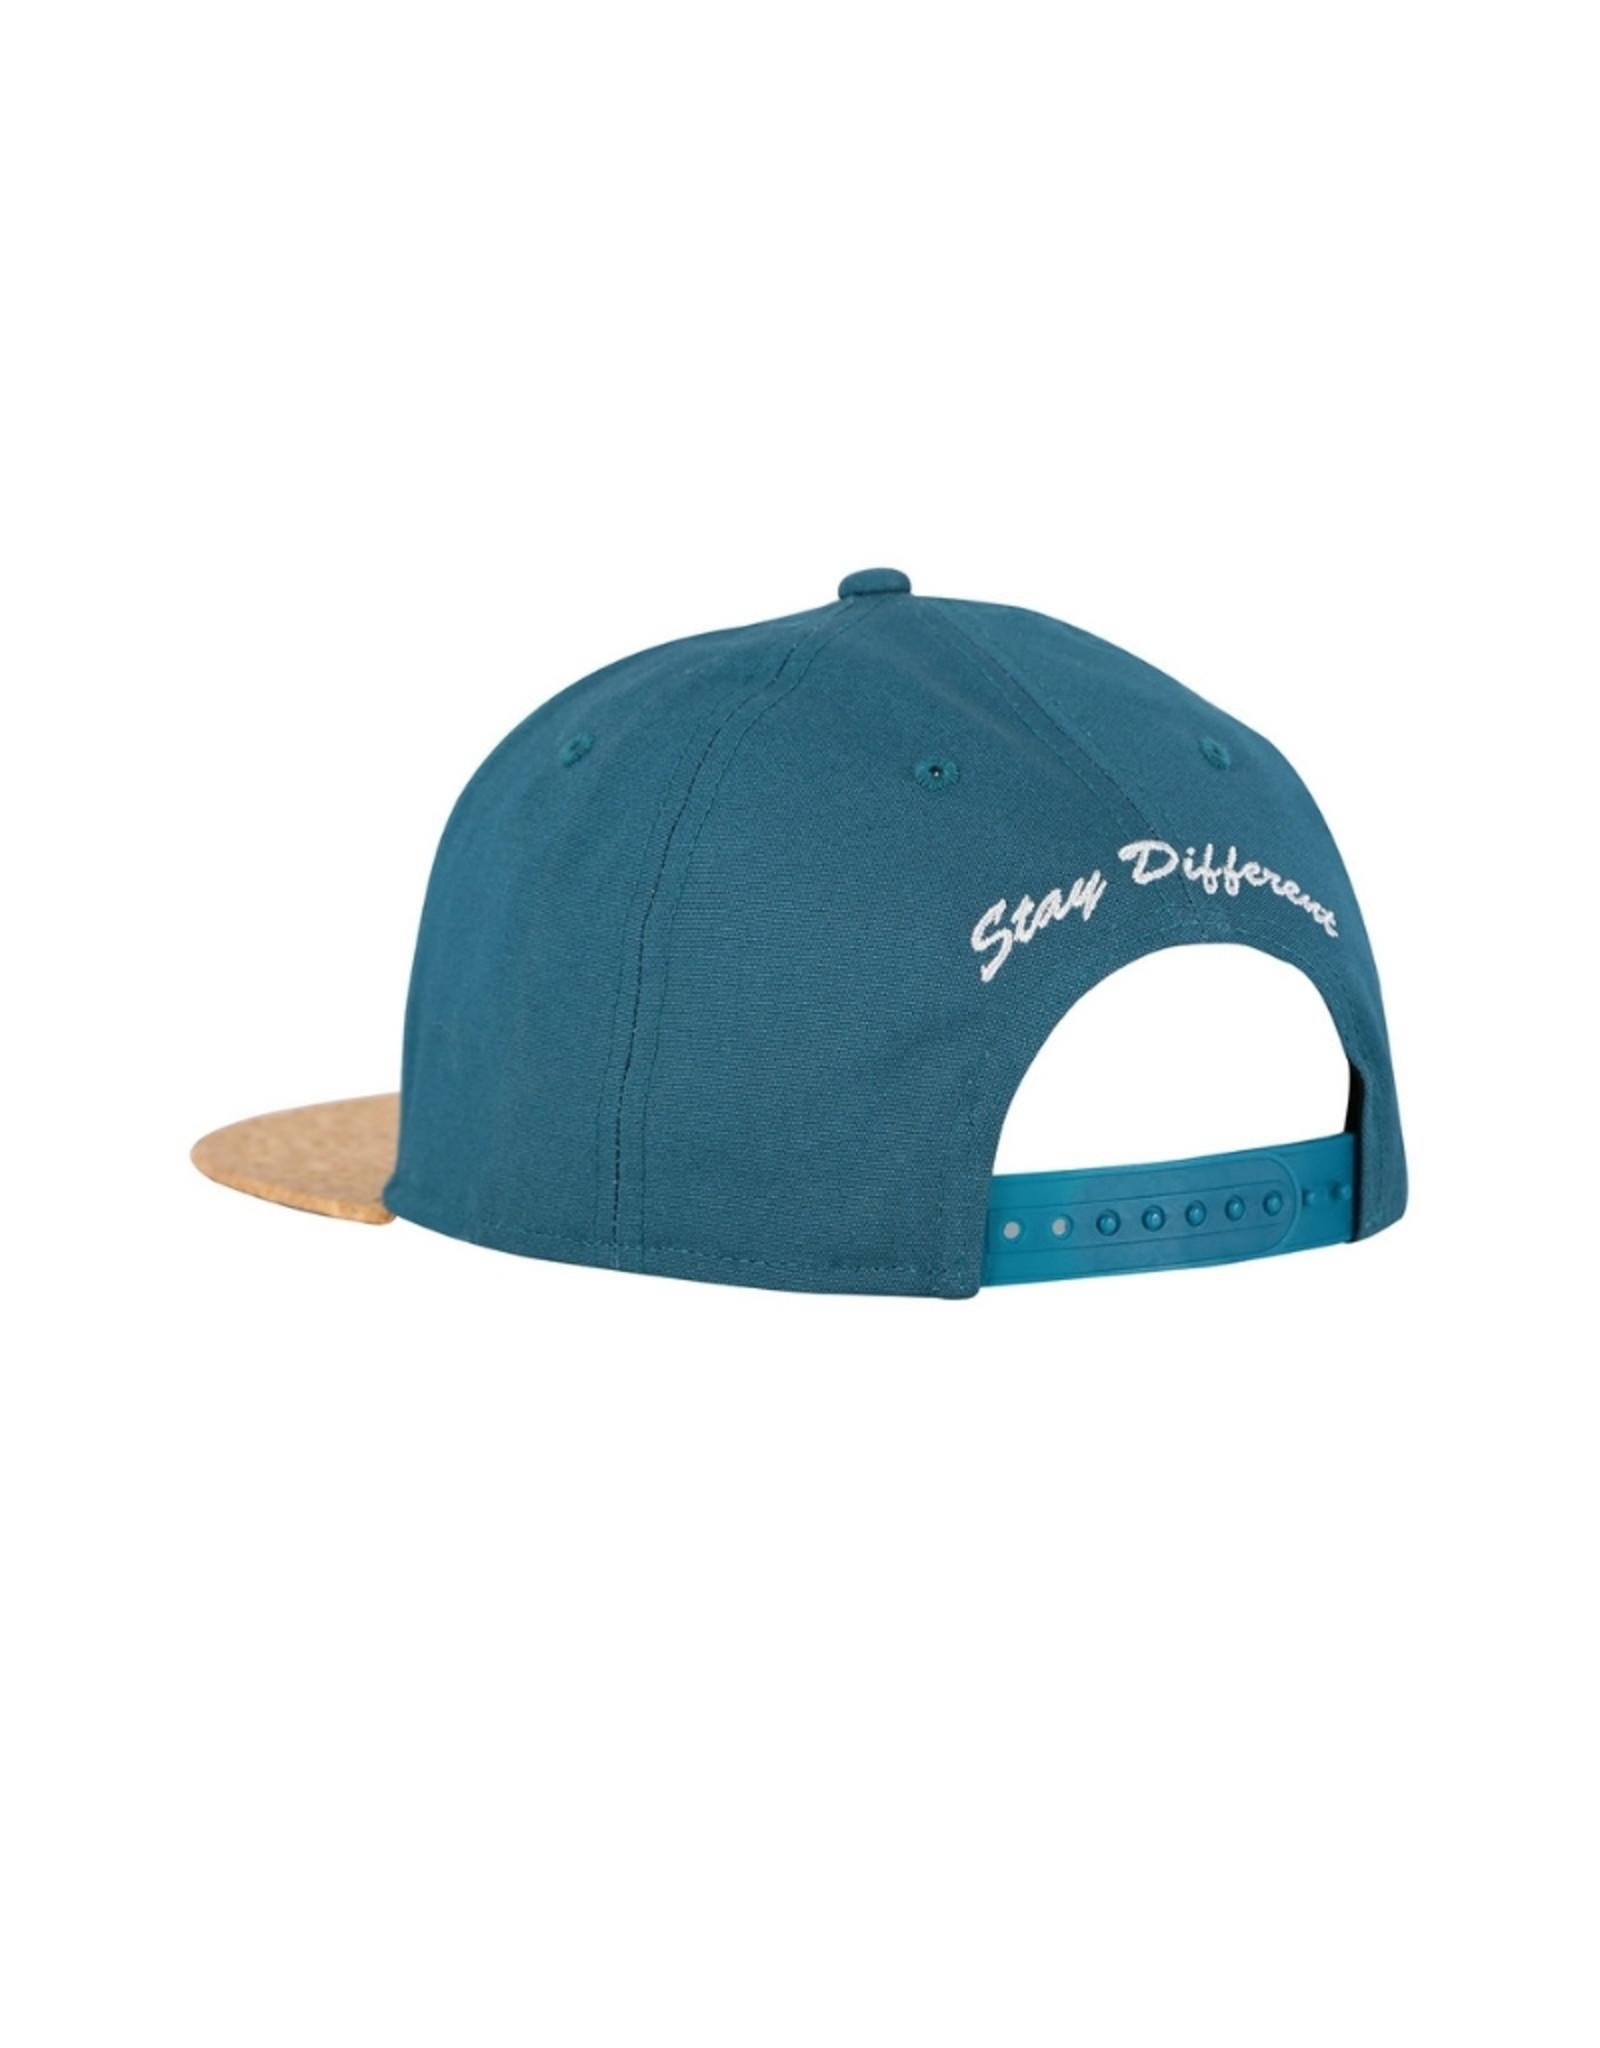 Irie Daily - EXCLUSIVE CORK CAP